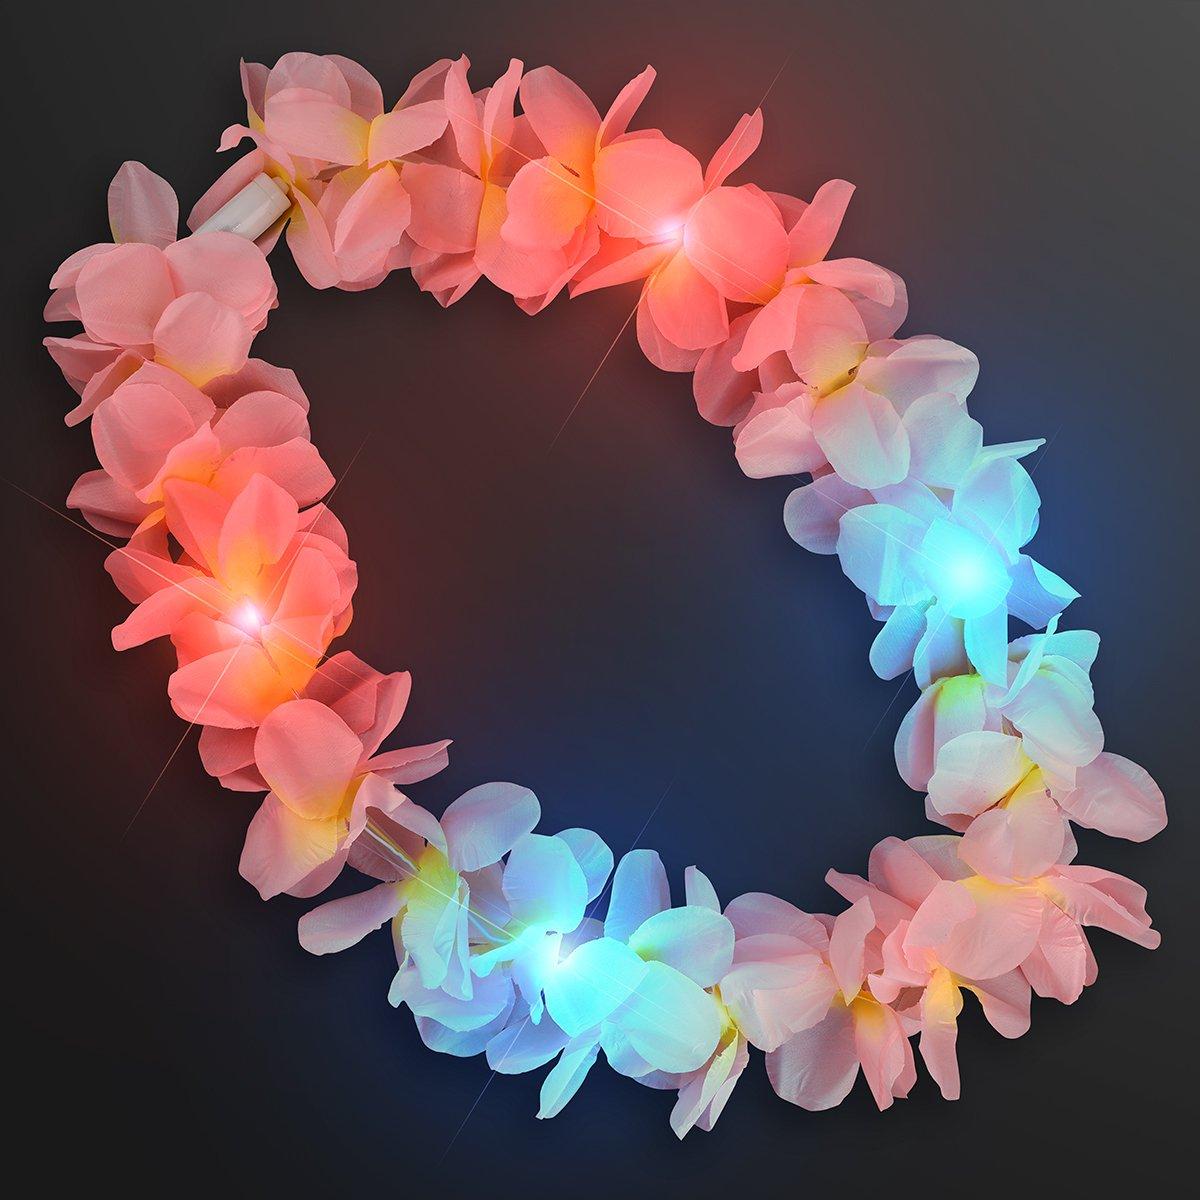 Large Assorted Light Up Hawaiian Leis with Flashing LED Lights (Set of 24) by FlashingBlinkyLights (Image #4)